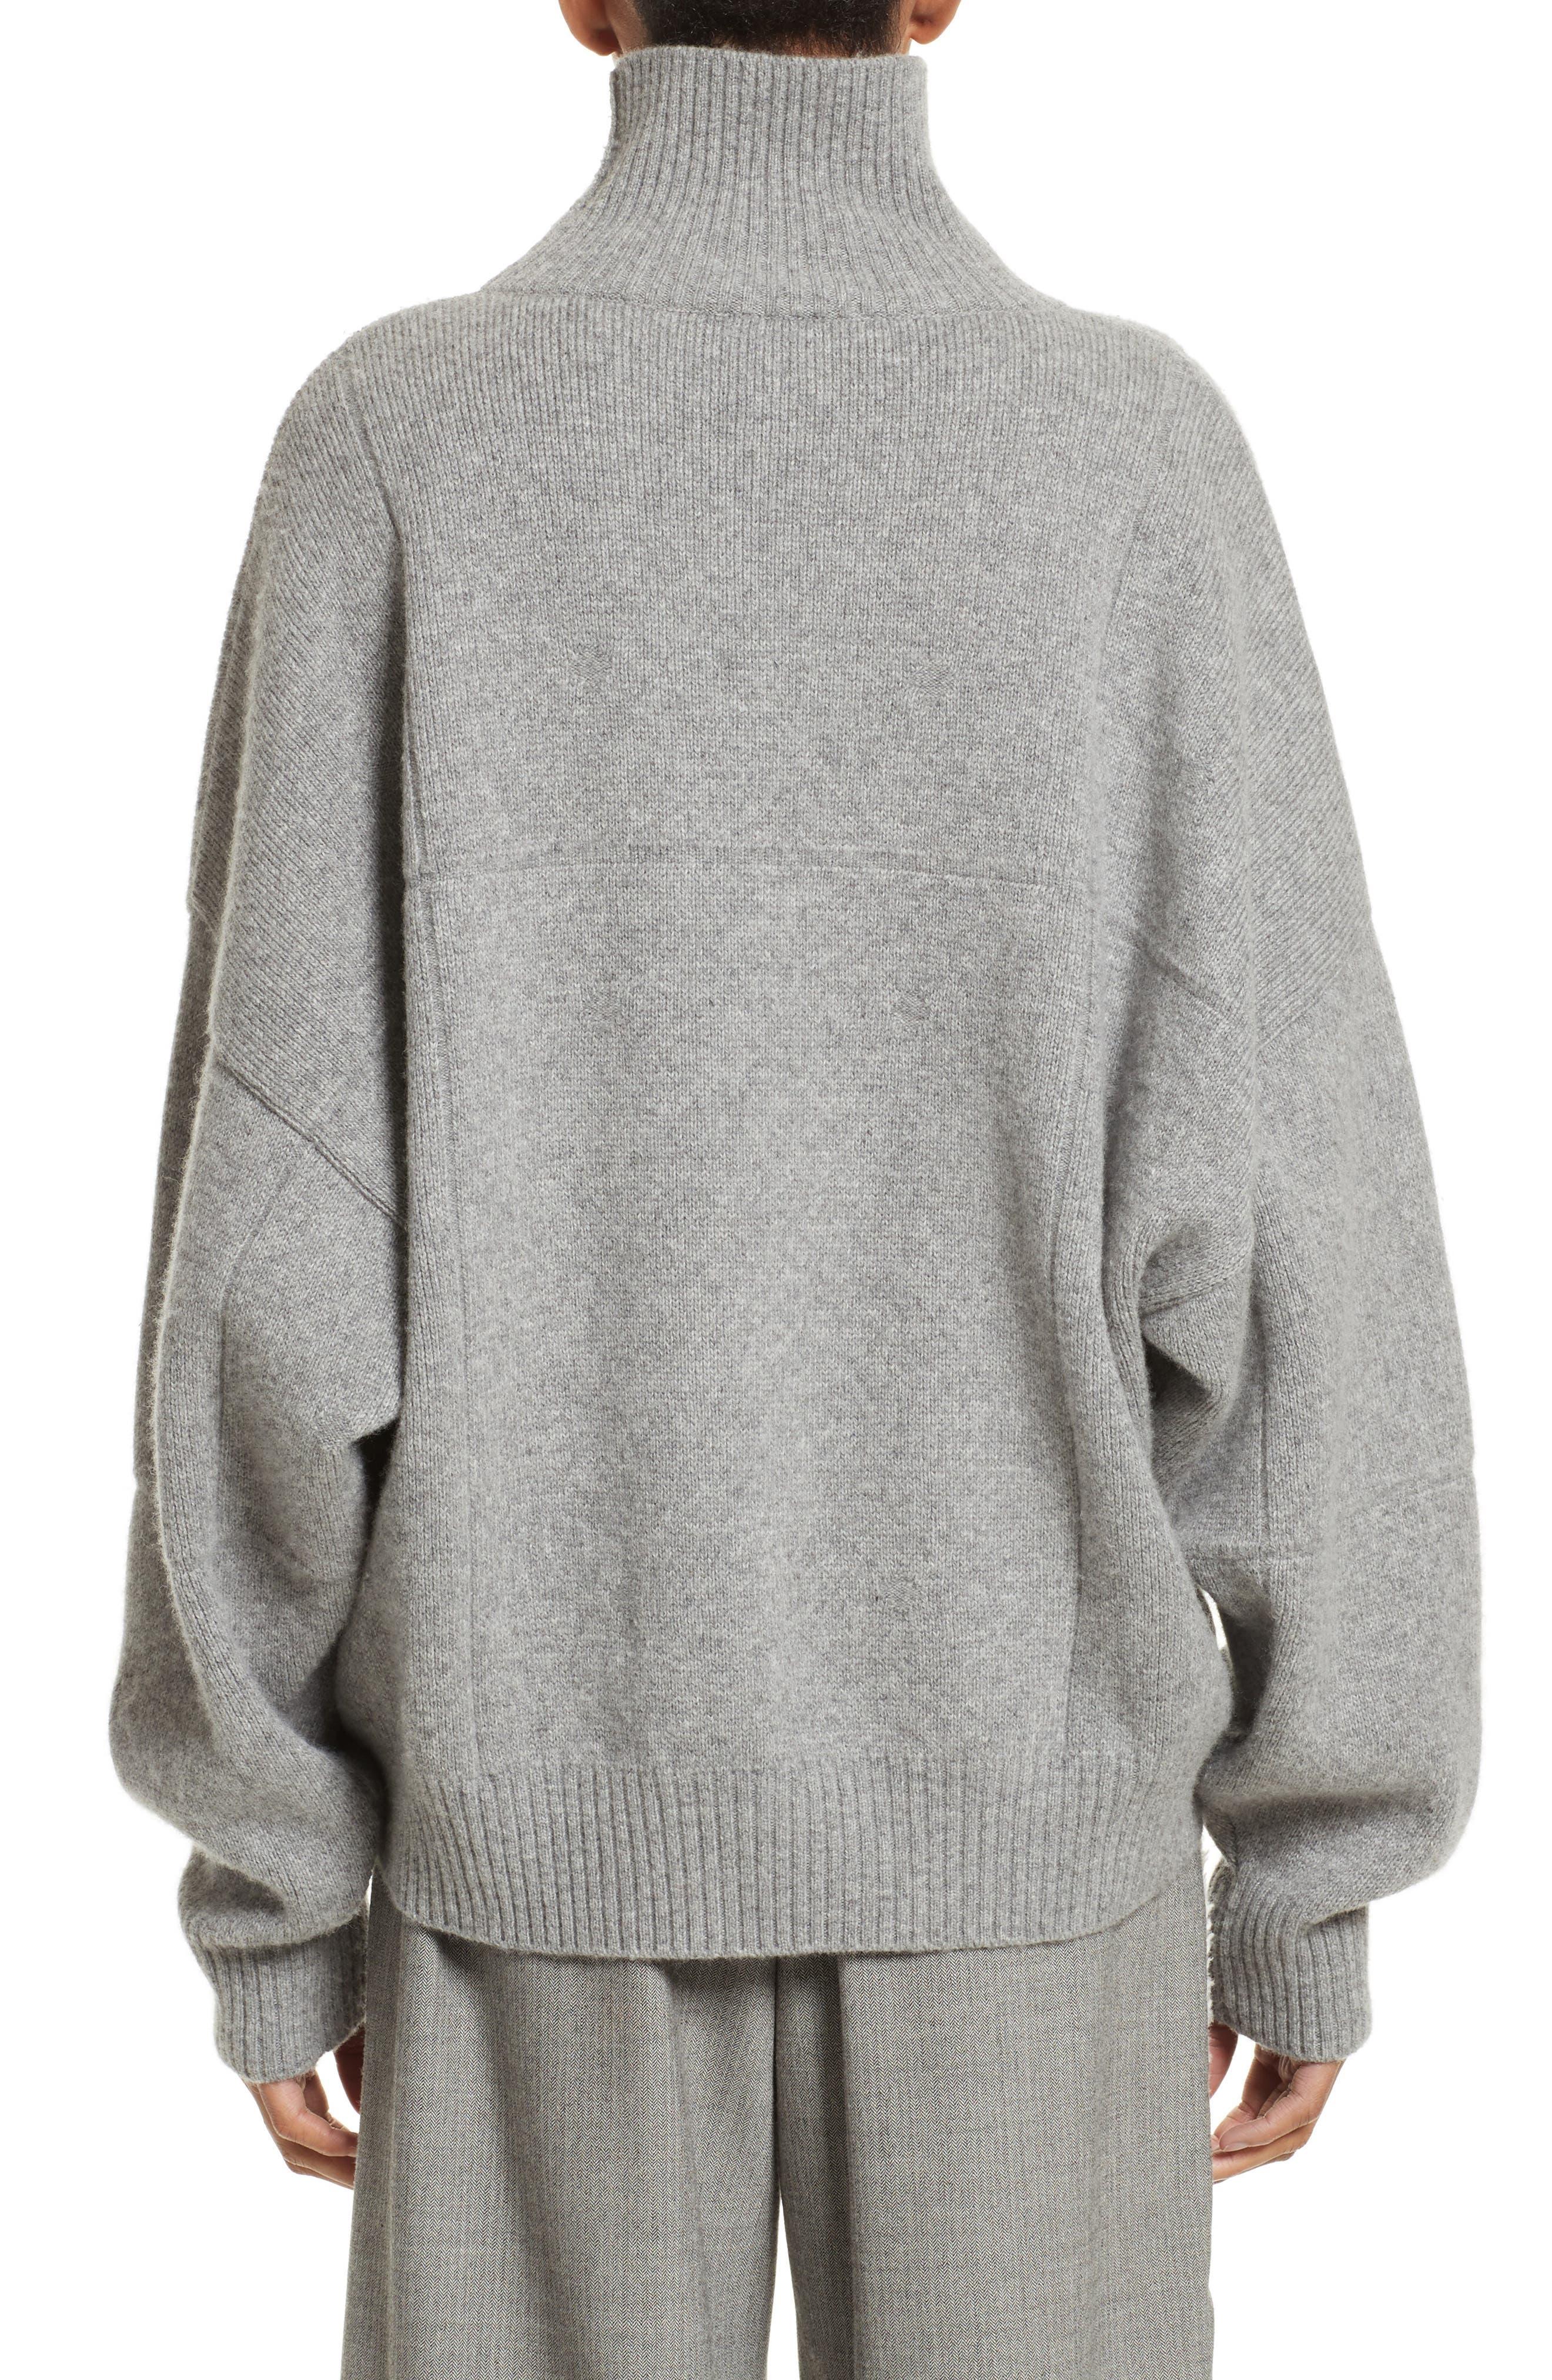 Concrete Wool Turtleneck Sweater,                             Alternate thumbnail 2, color,                             050